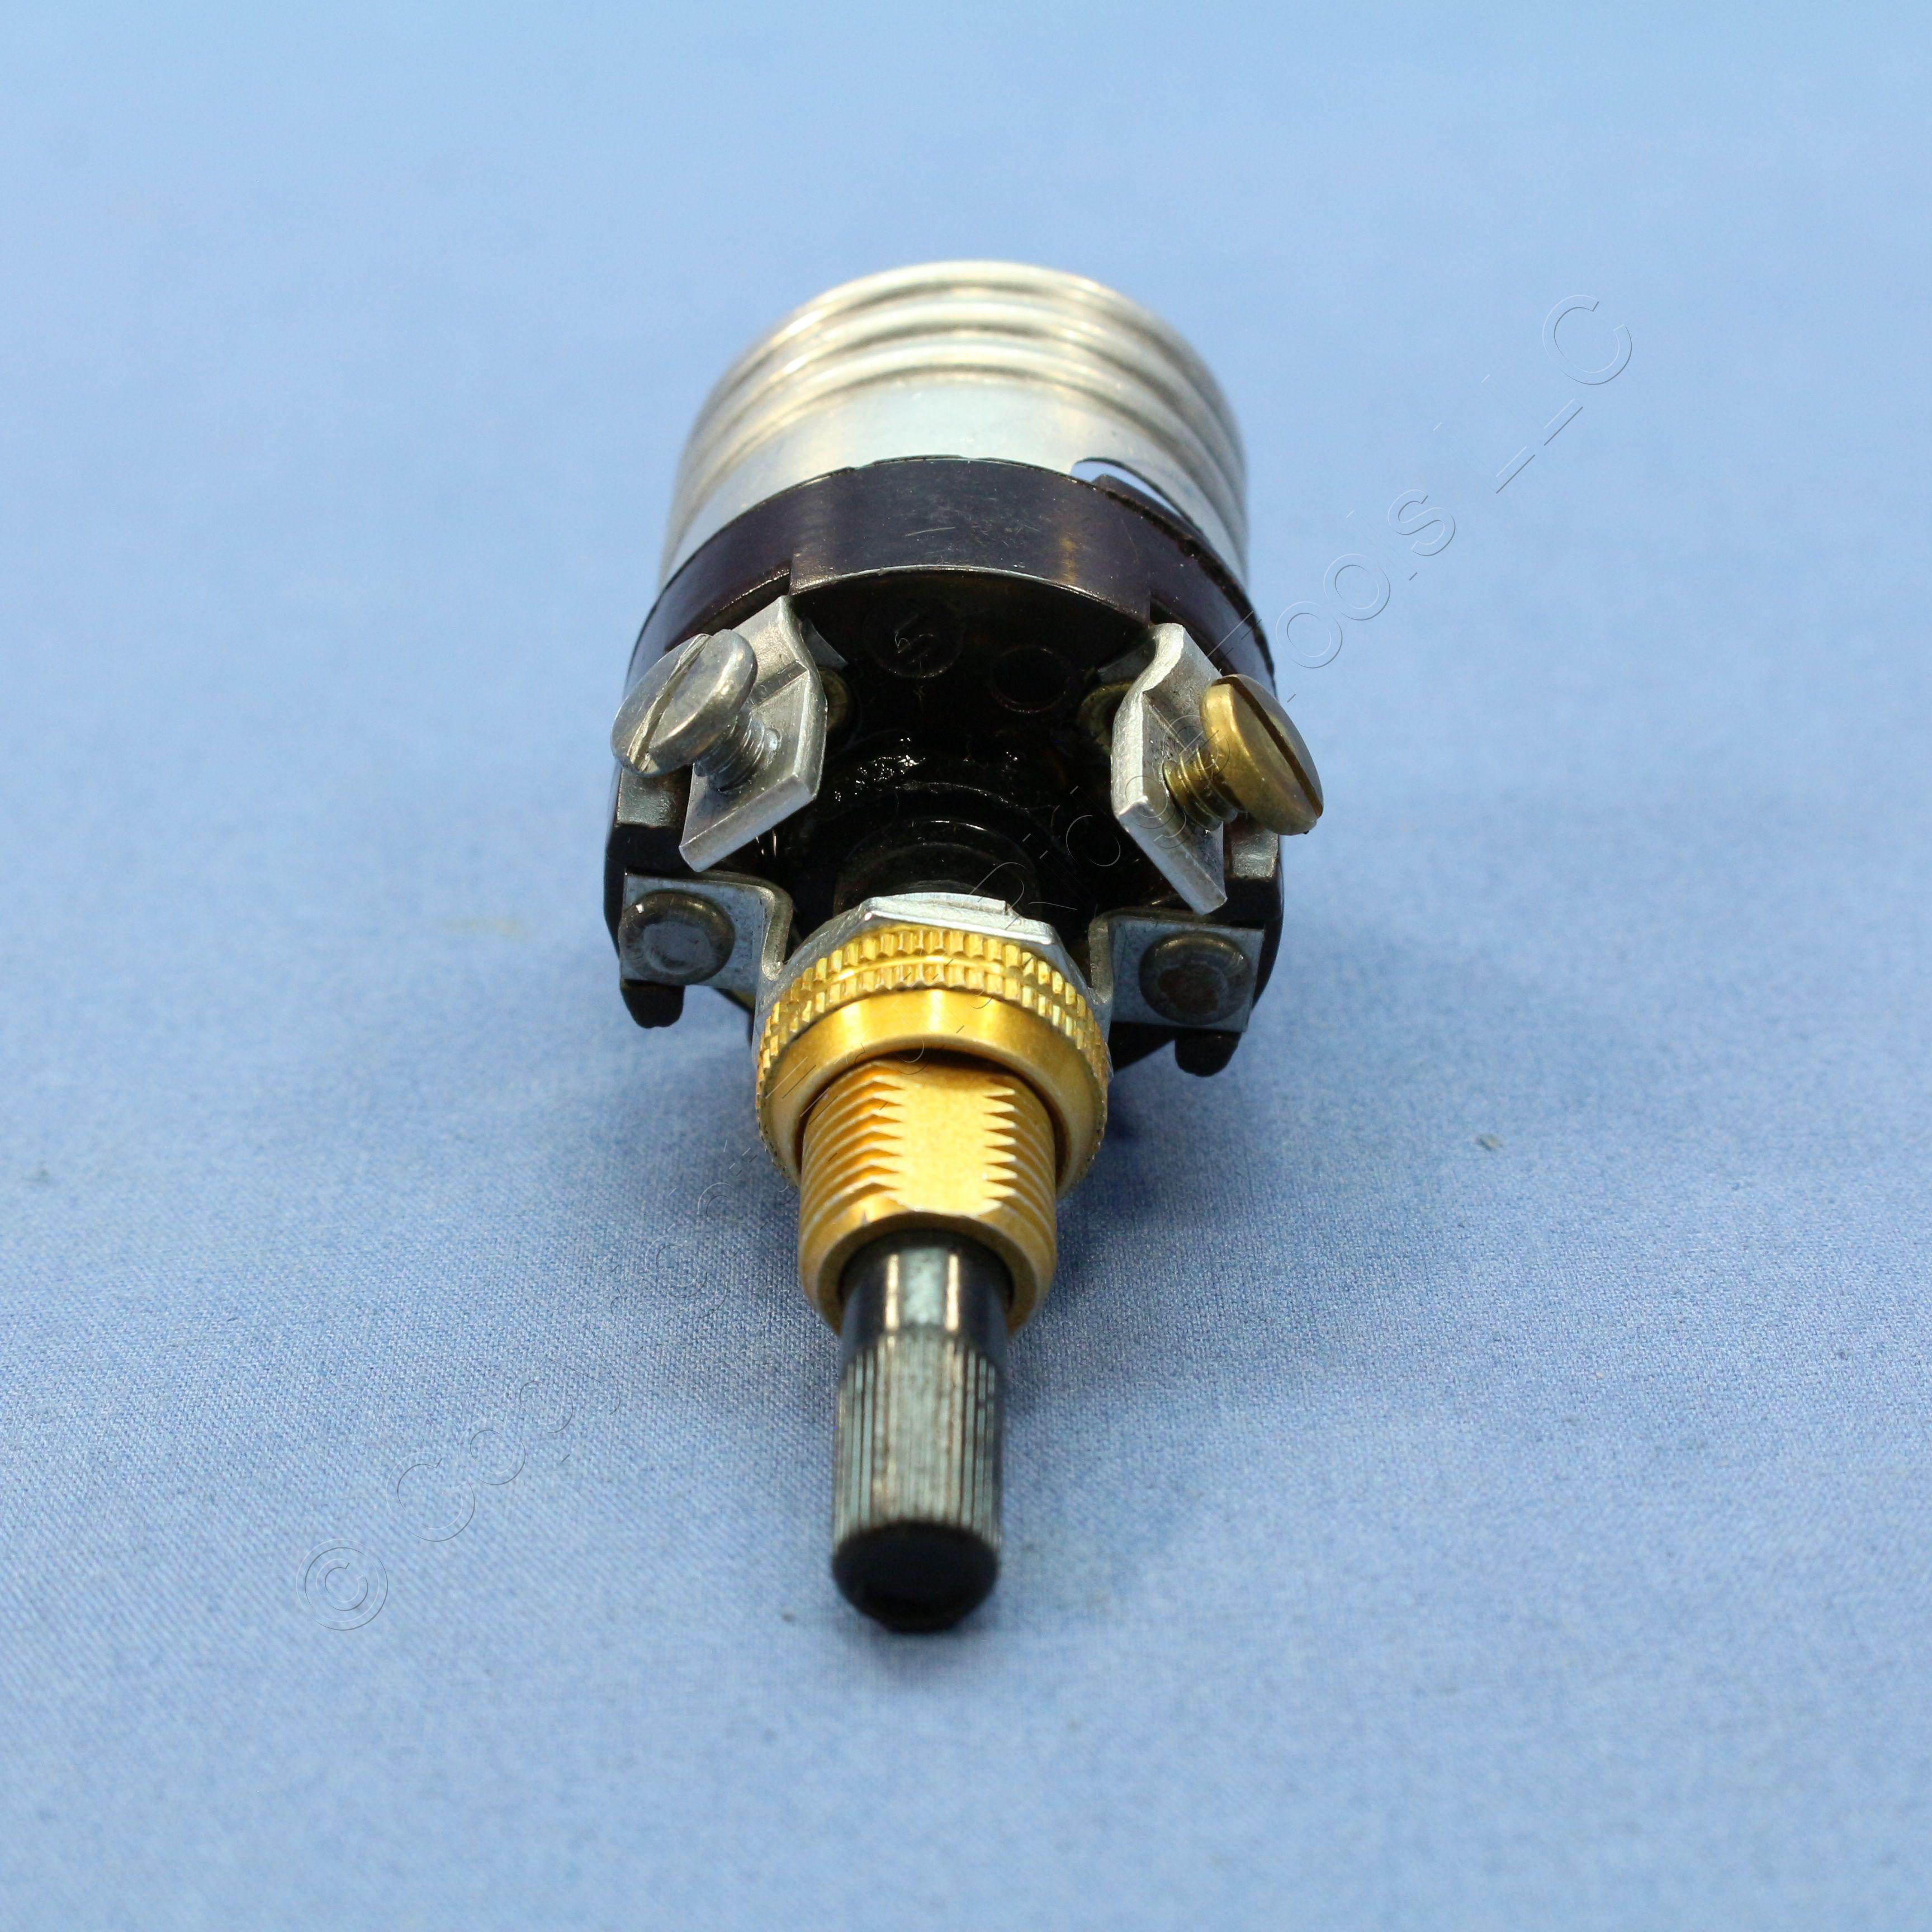 Buy Leviton Bottom Turn Knob Candle Light Socket Lampholder Core ...